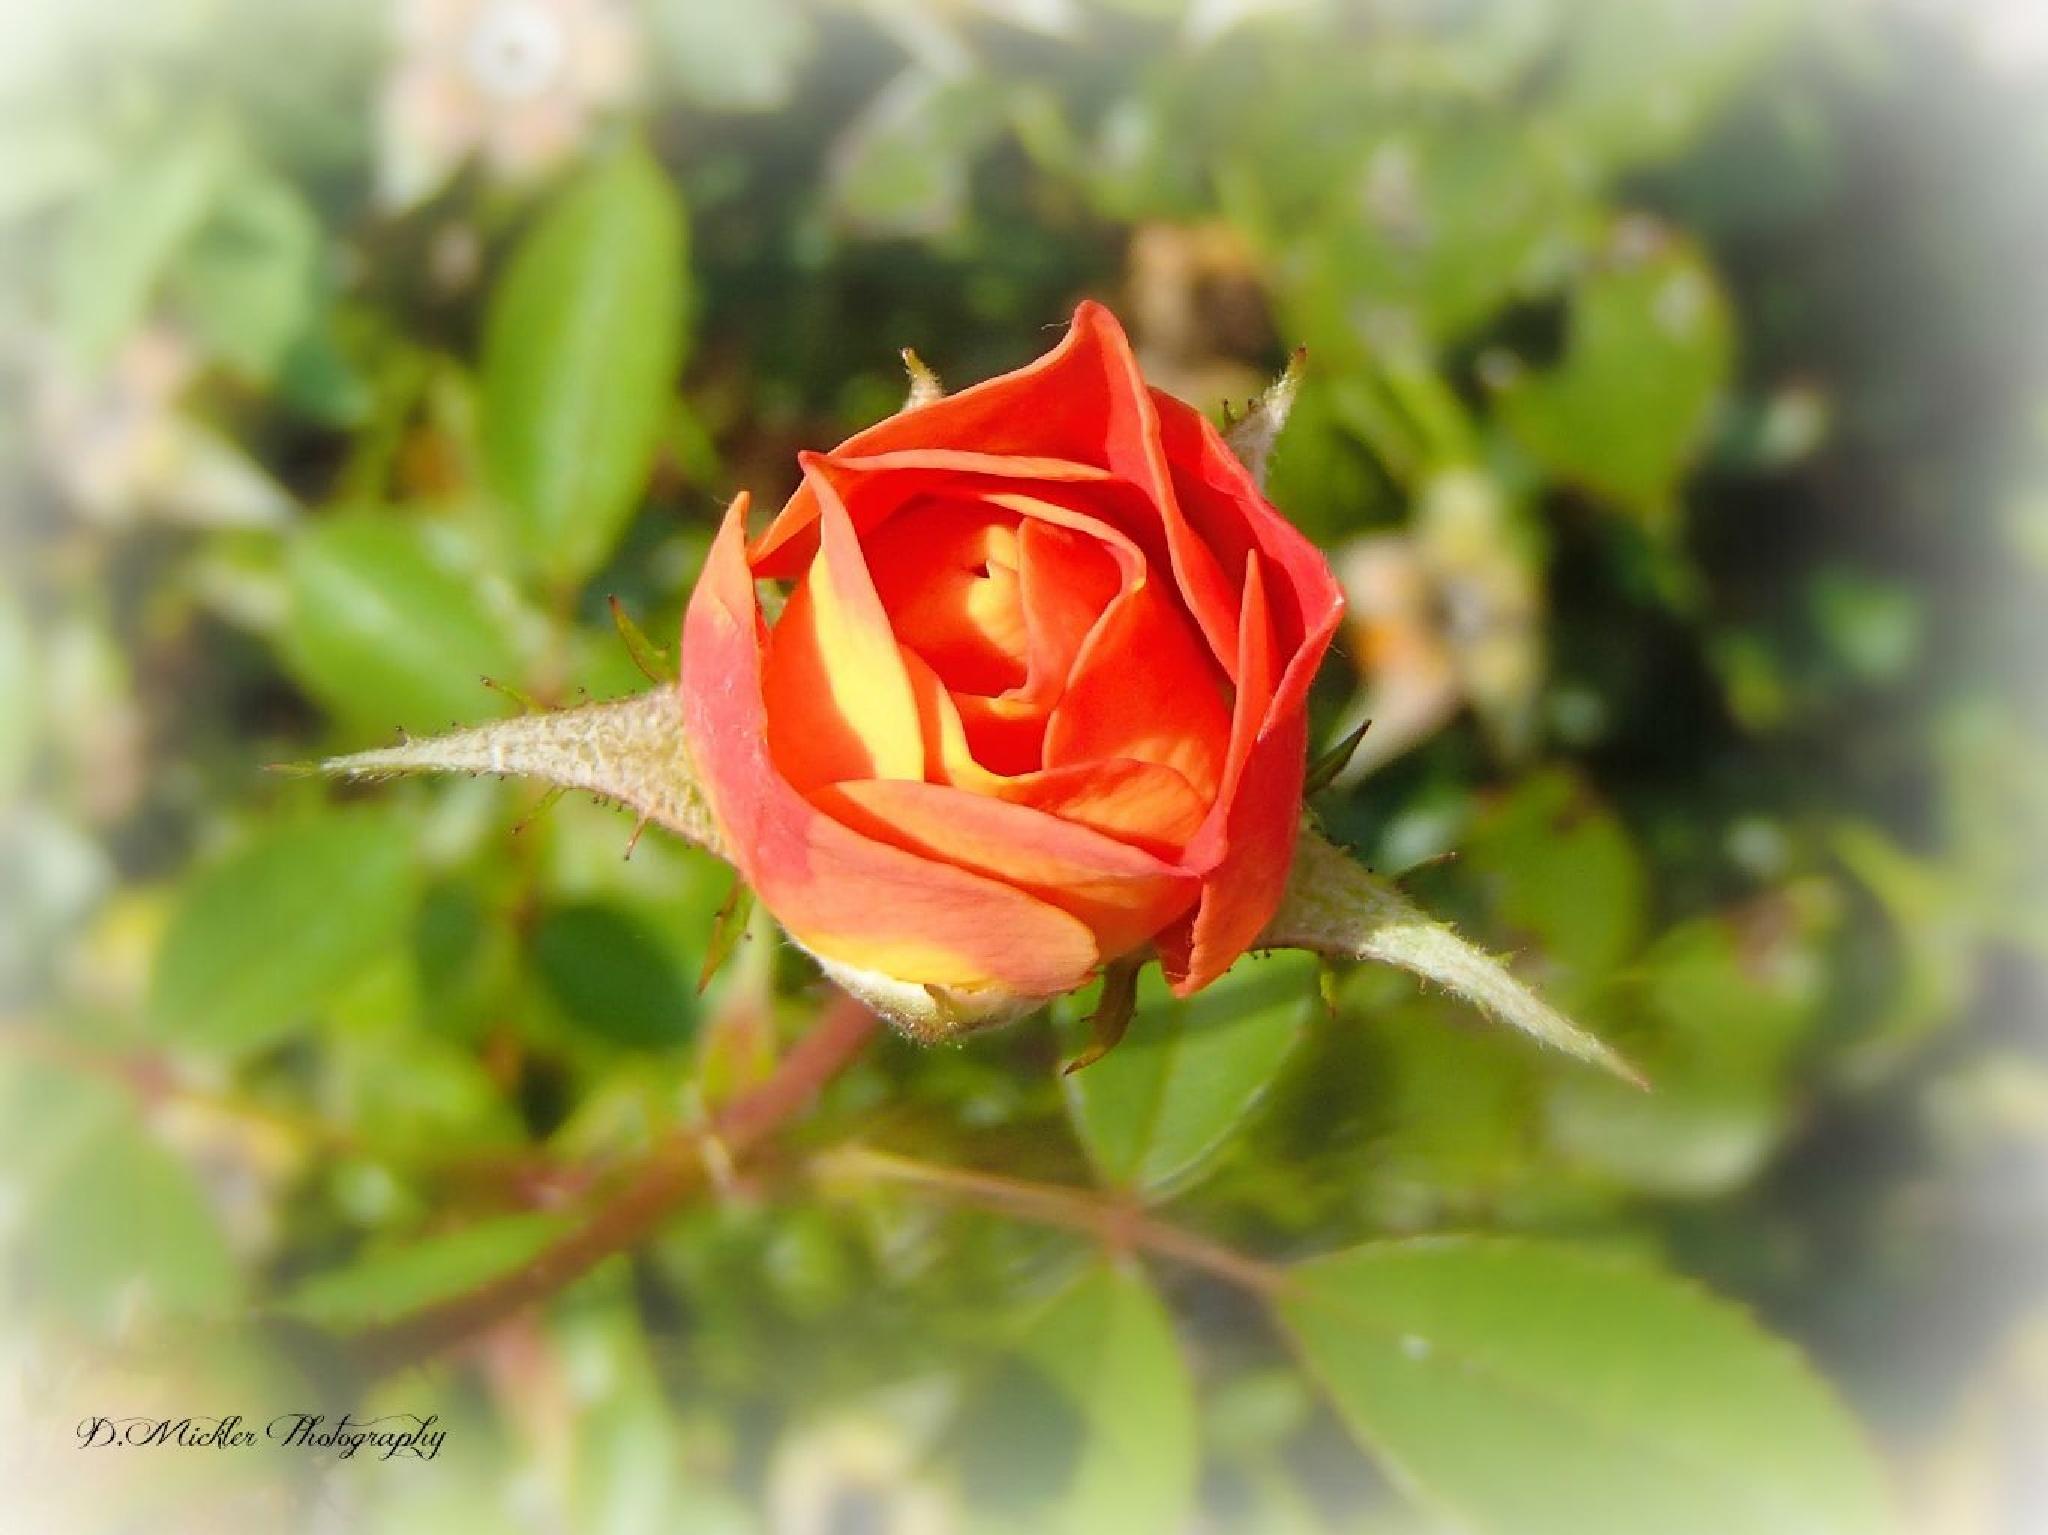 In The Garden by dmickler